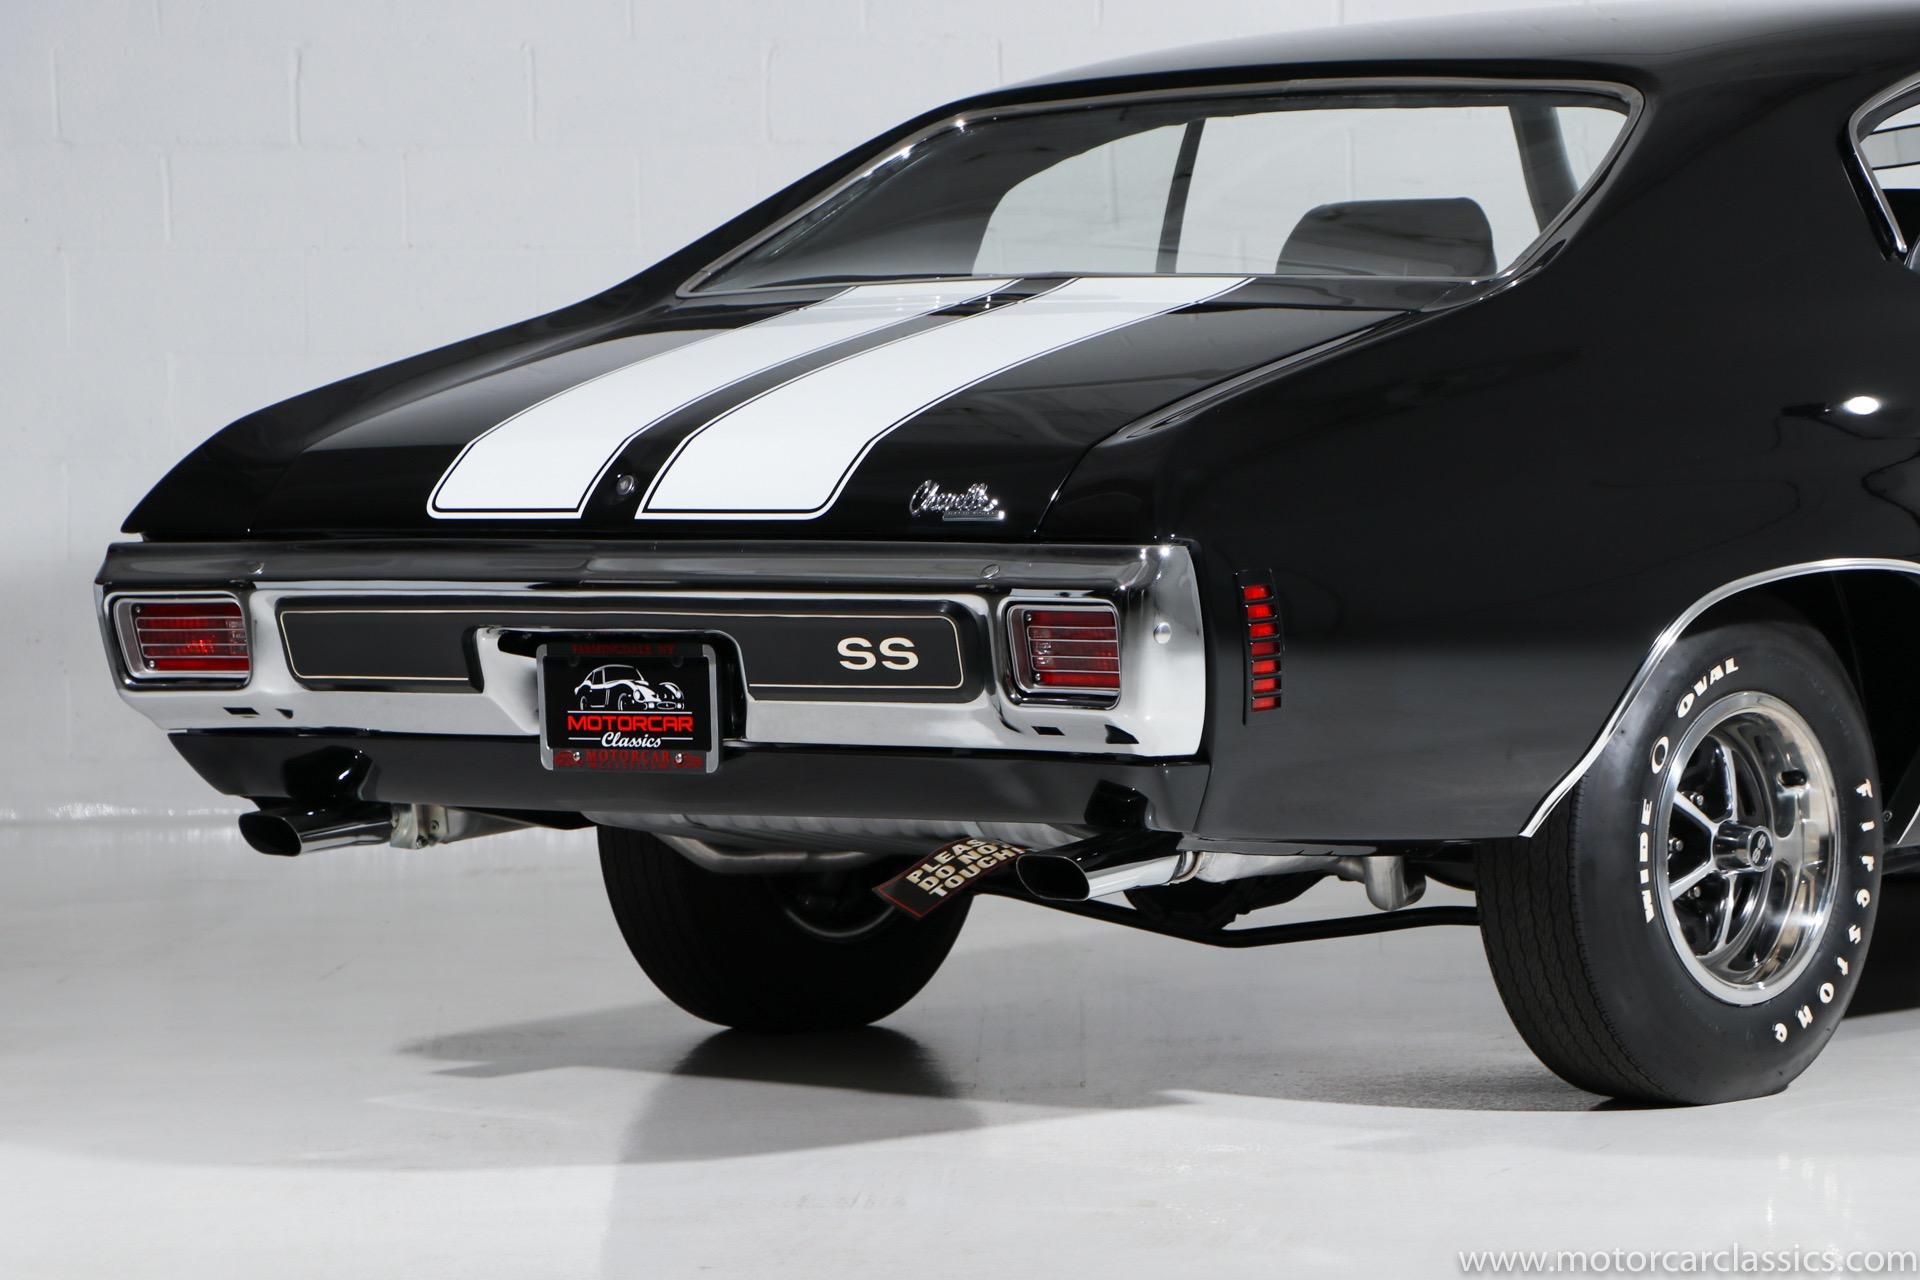 1970 Chevrolet Chevelle SS LS6